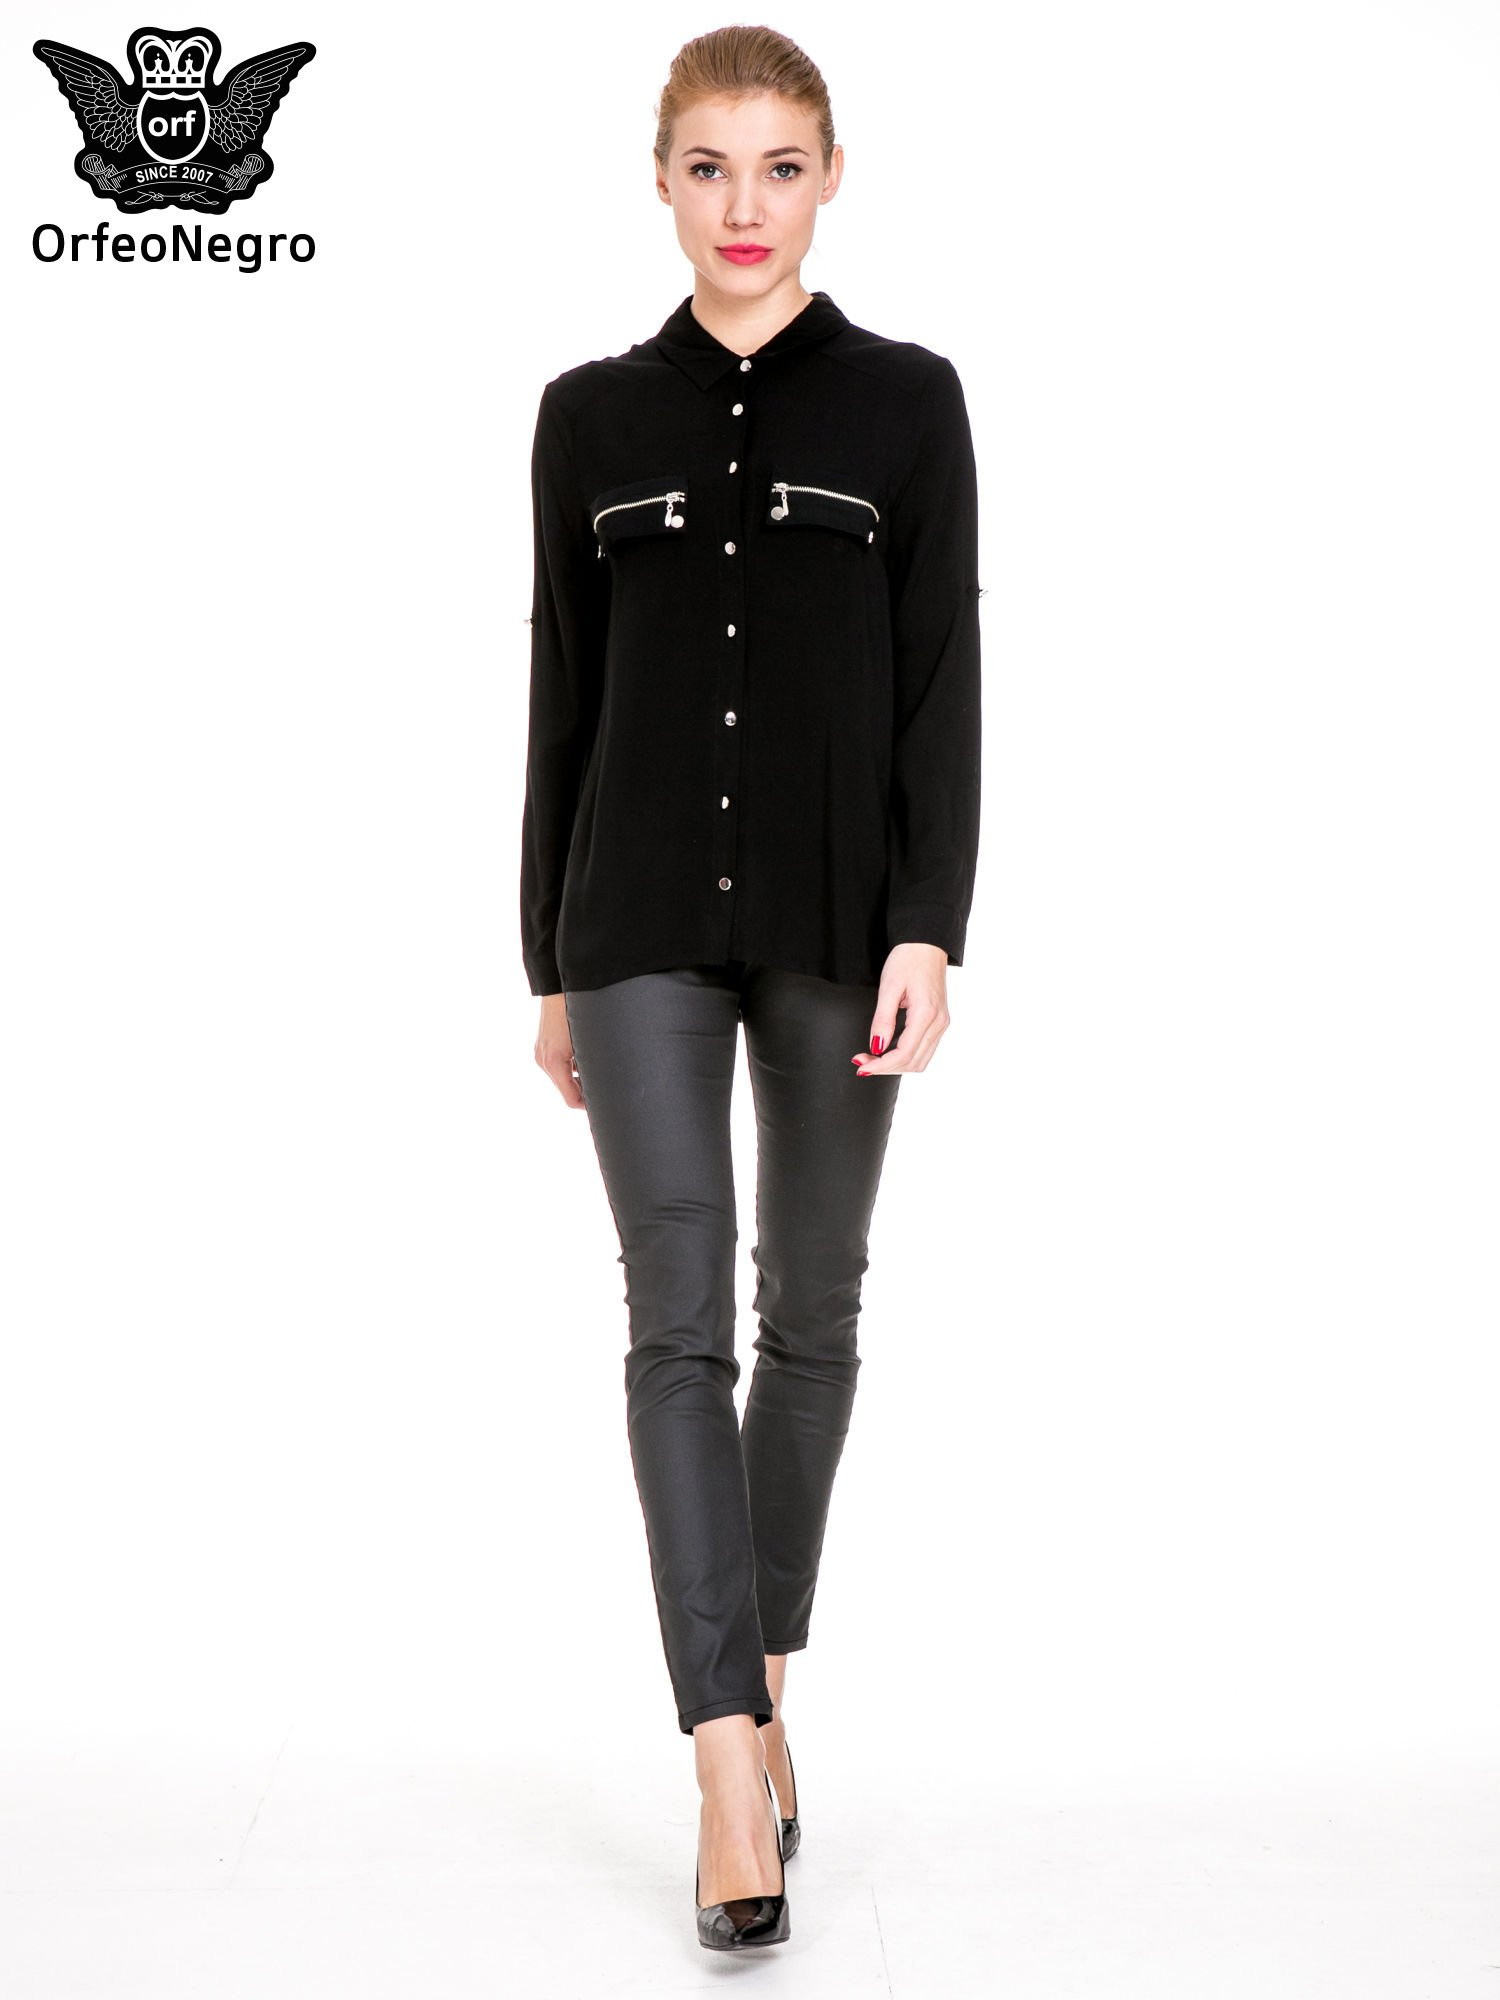 Czarna elegancka koszula z suwakami i napami                                  zdj.                                  2